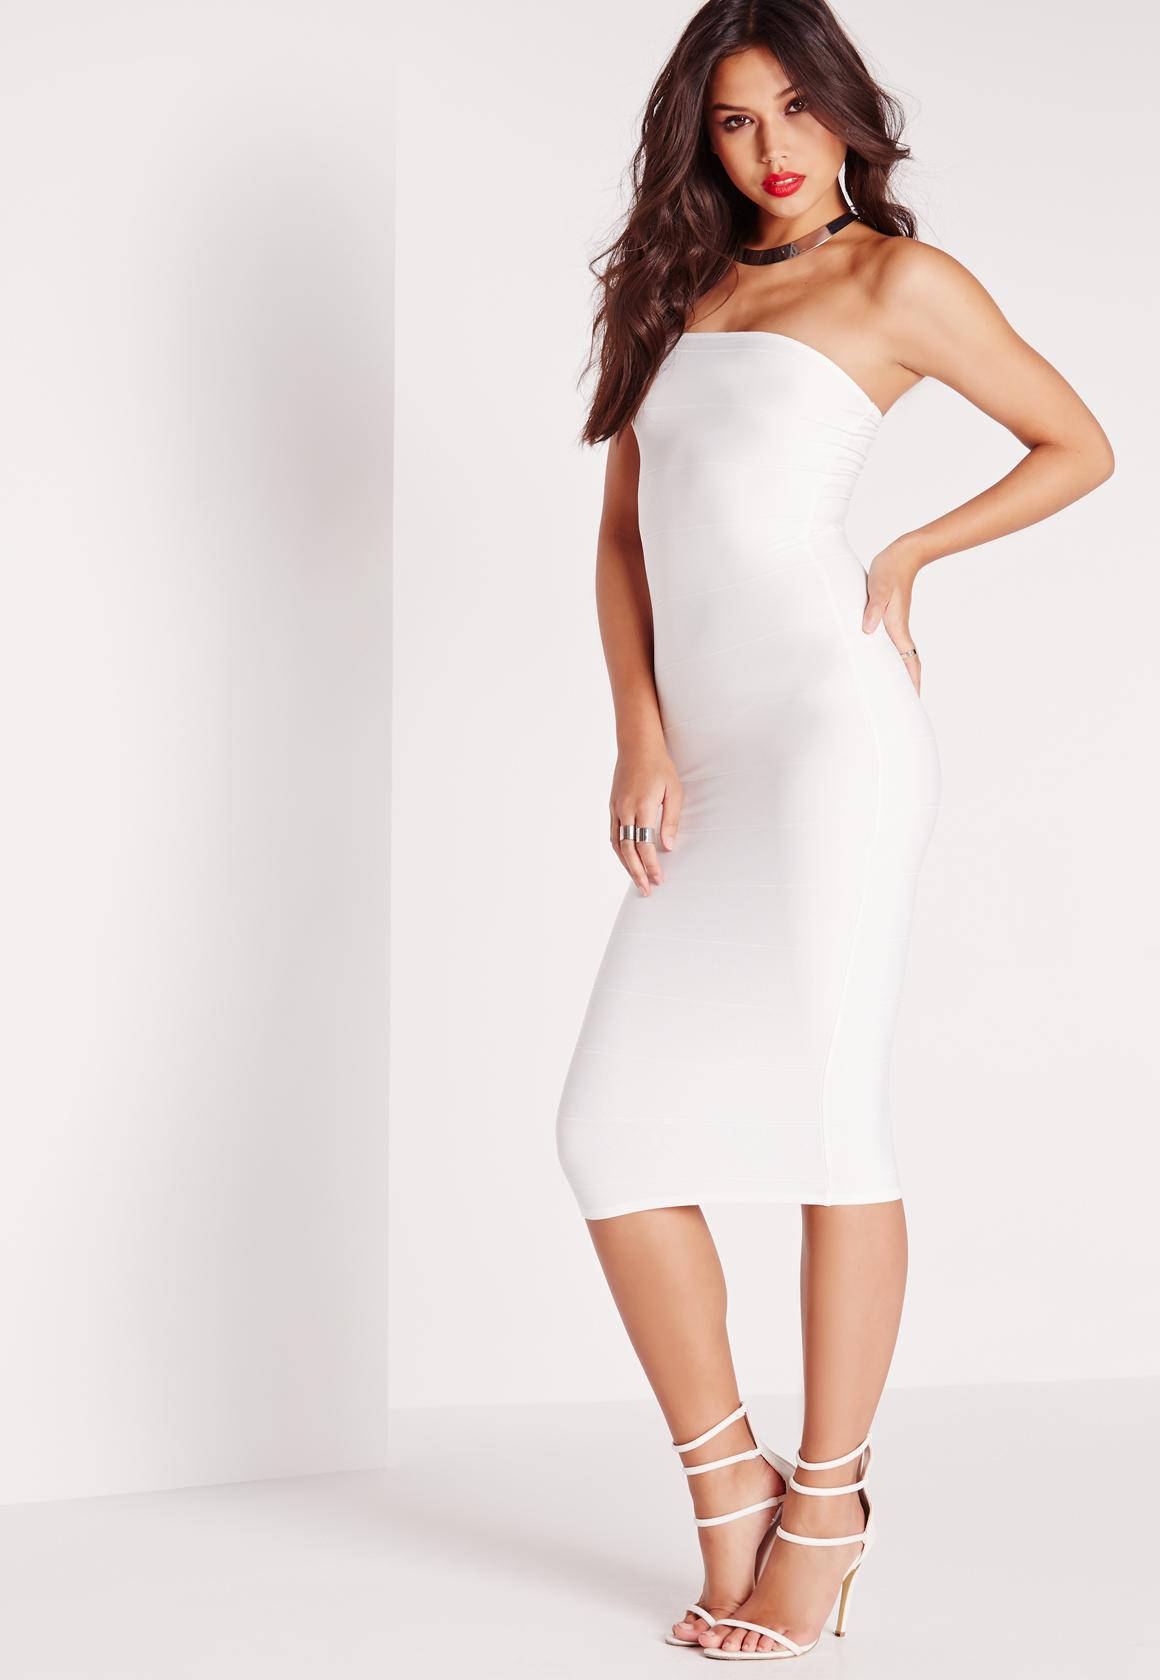 Missguided Strapless Bandage Bodycon Midi Dress White in White | Lyst